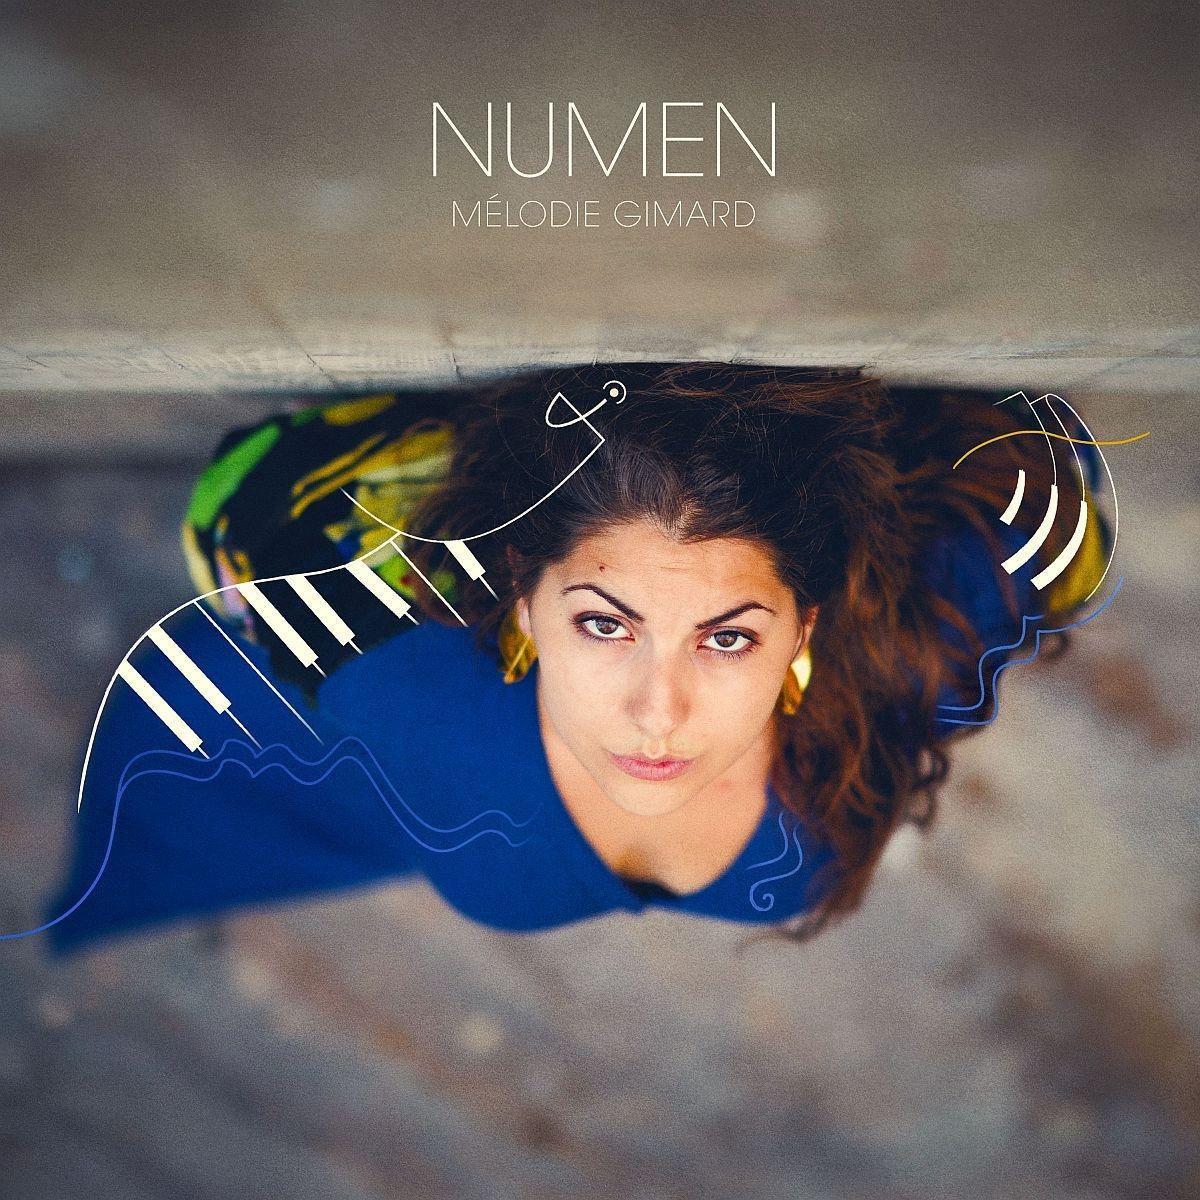 bol.com | Numen, Melodie Gimard | CD (album) | Muziek